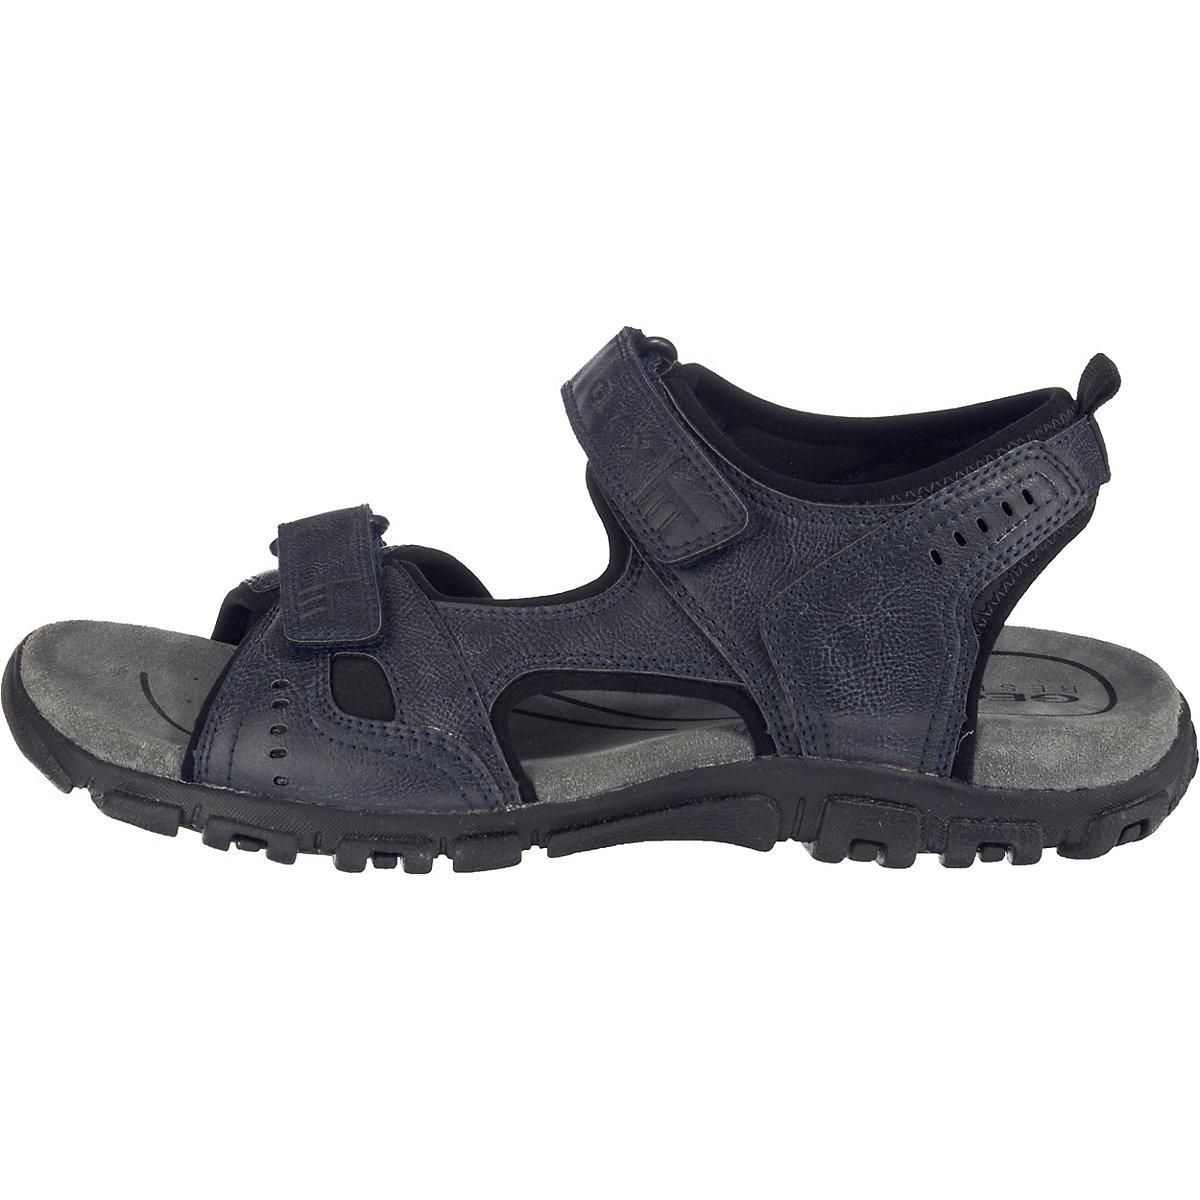 Geox, Komfort-sandalen, Blau